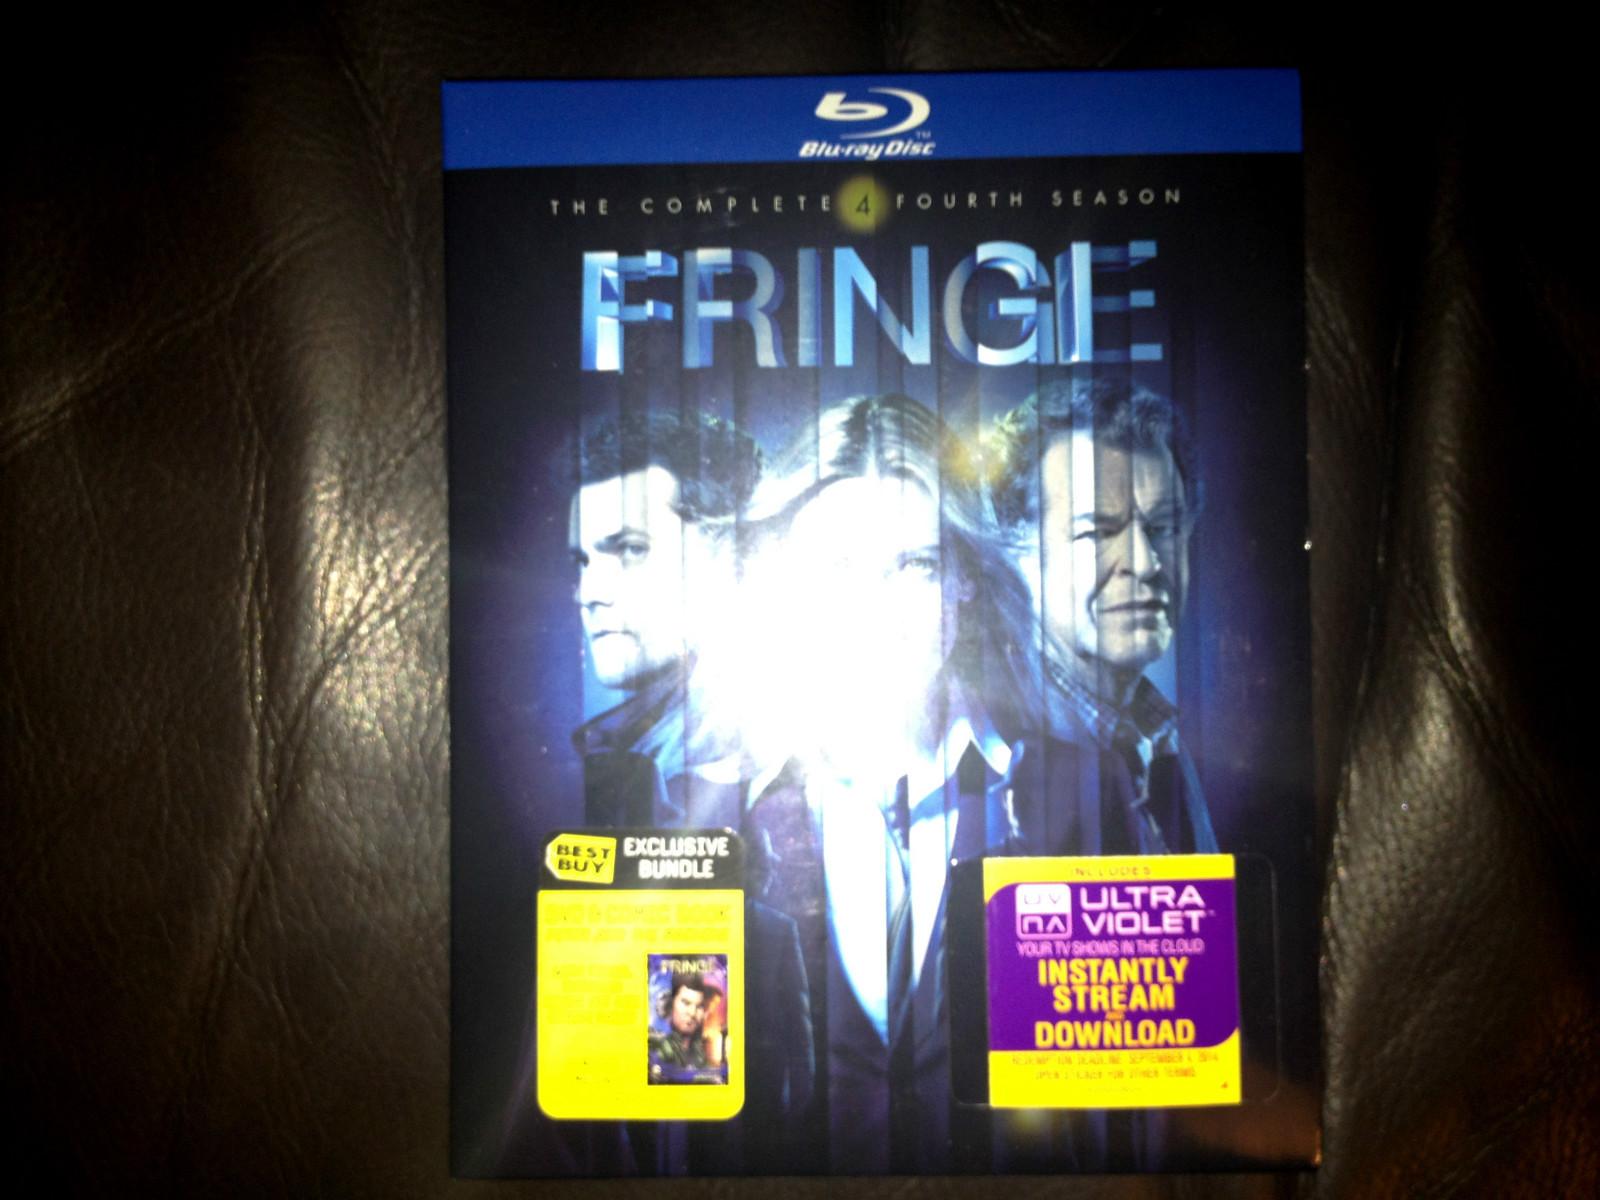 best buy fringe season 3Blu ray DVD Exclusives  Fringe  The Complete Fourth Season  Best whExbTKb